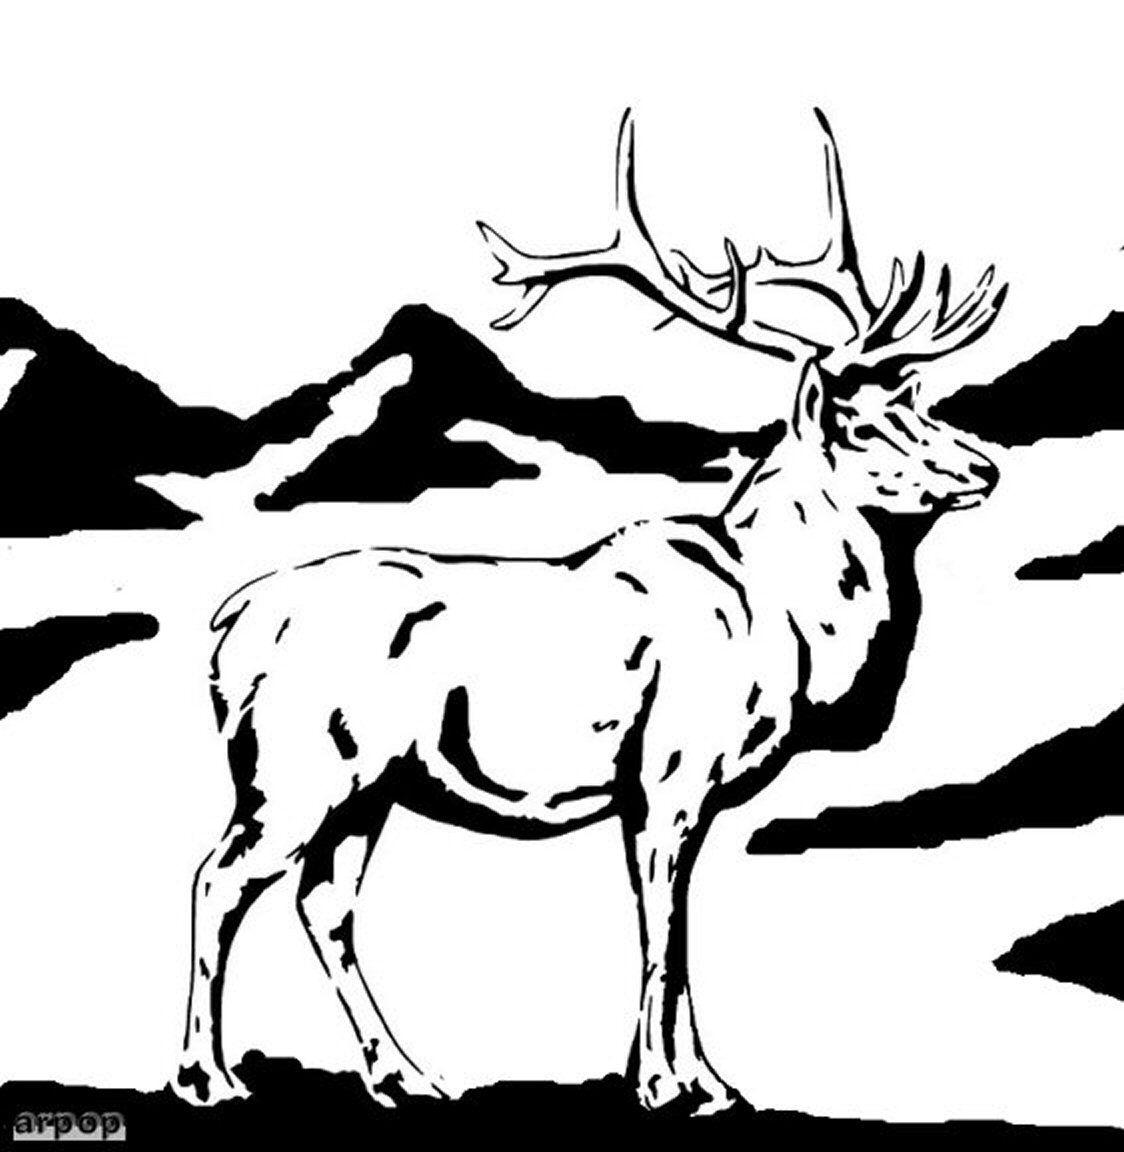 Free Scroll Saw Patterns by Arpop: Elk Scroll Saw Pattern